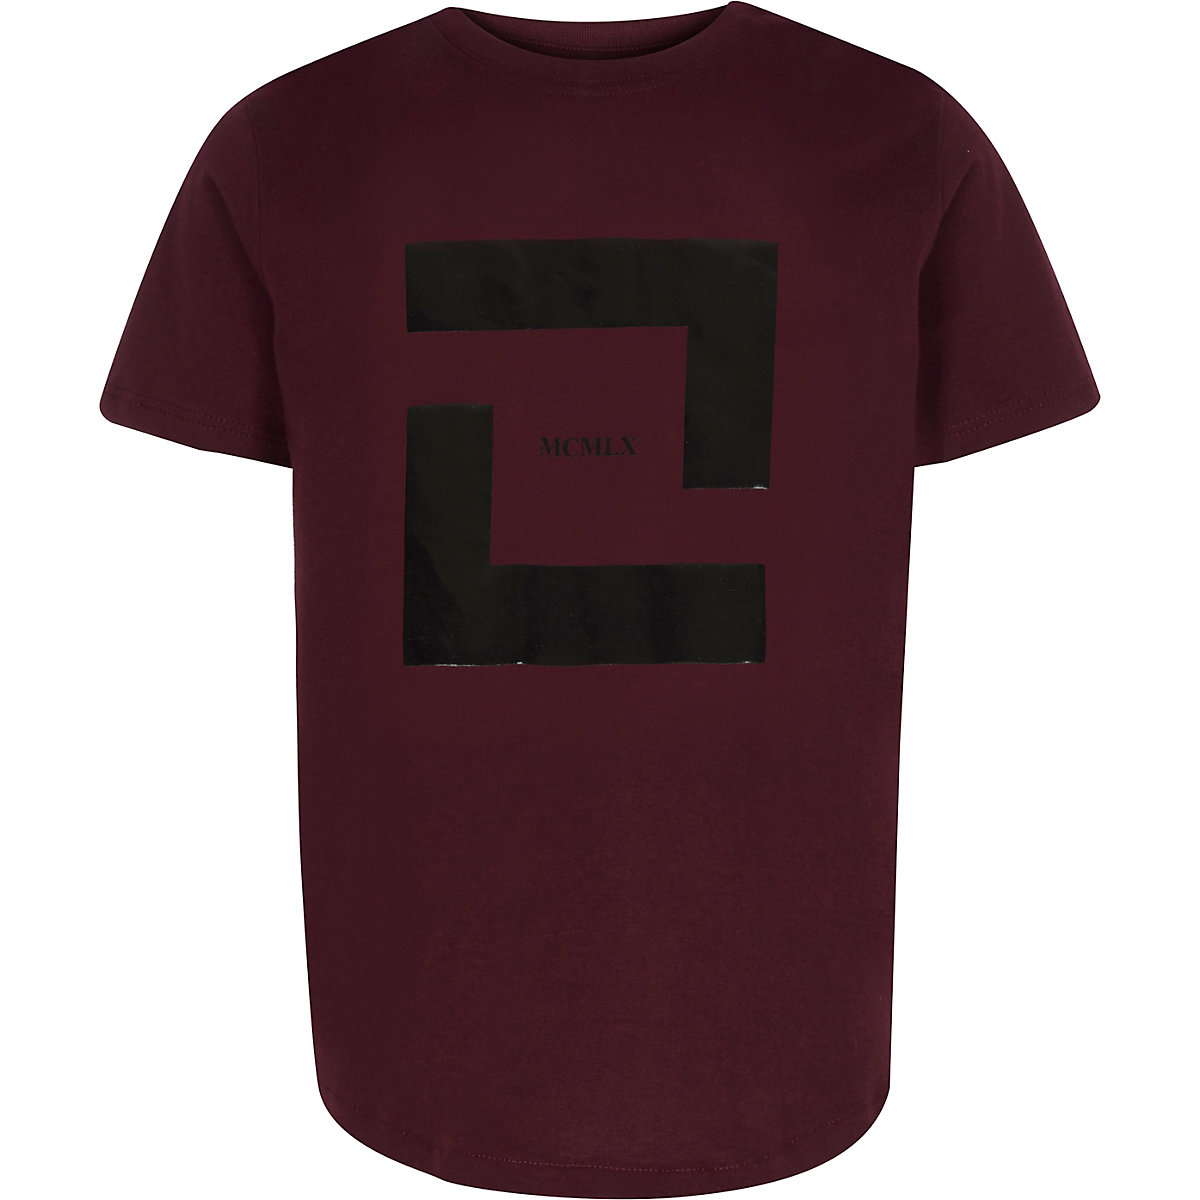 Boys burgundy box print T-shirt